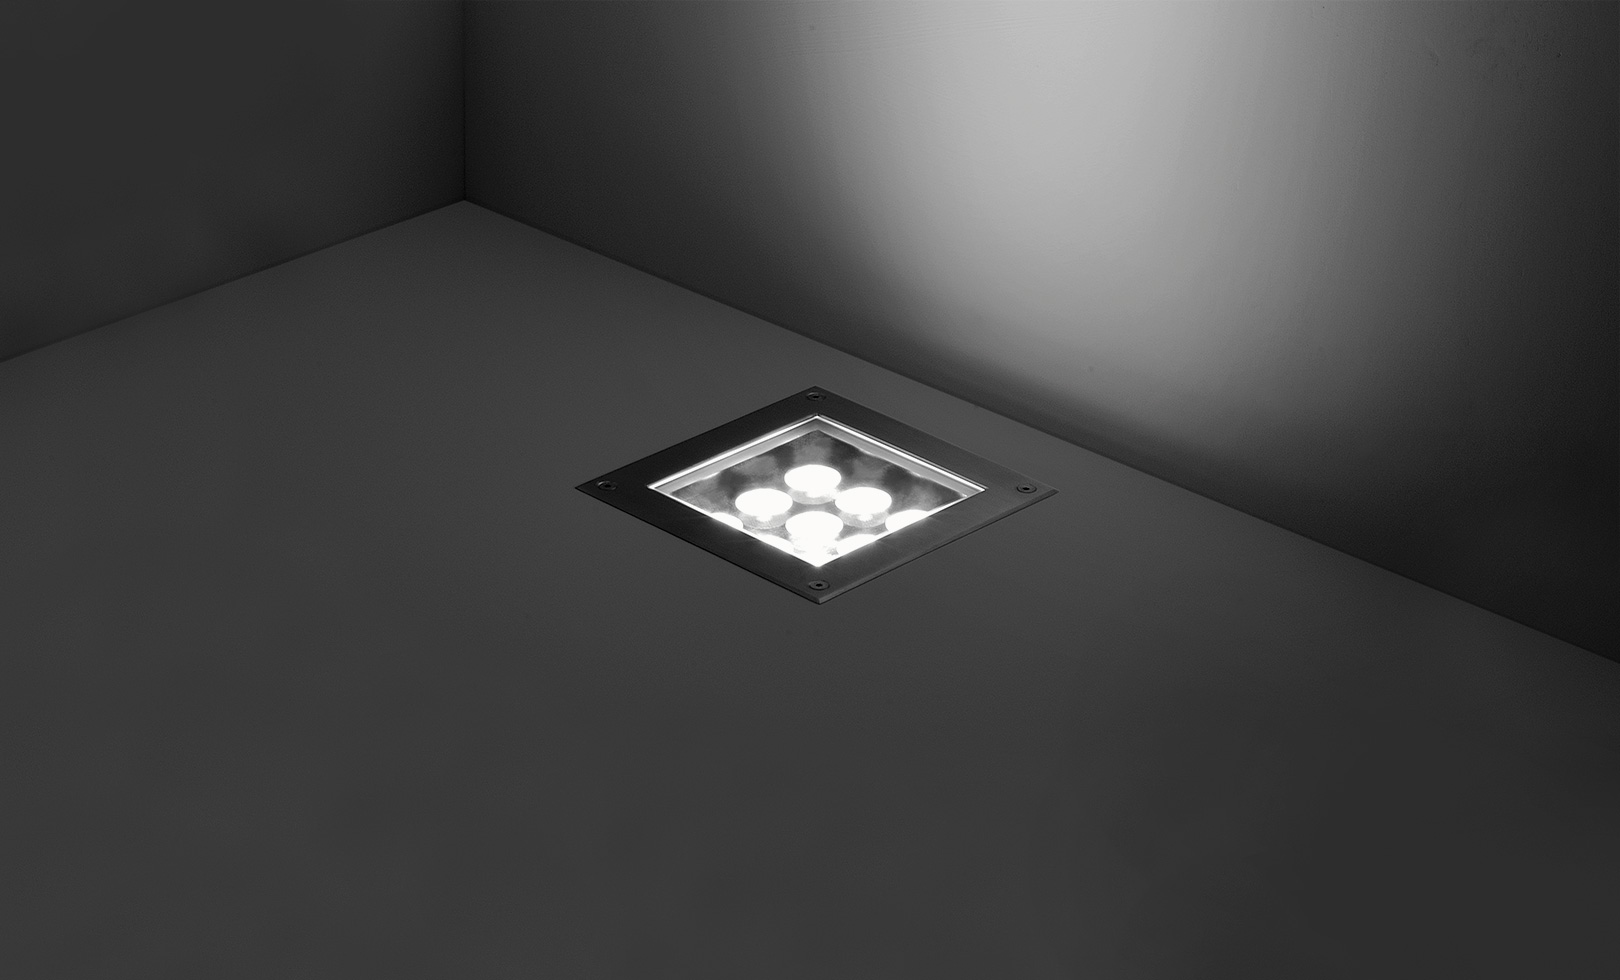 202008 HYDROQUADRO MEDIUM LED 14W 1